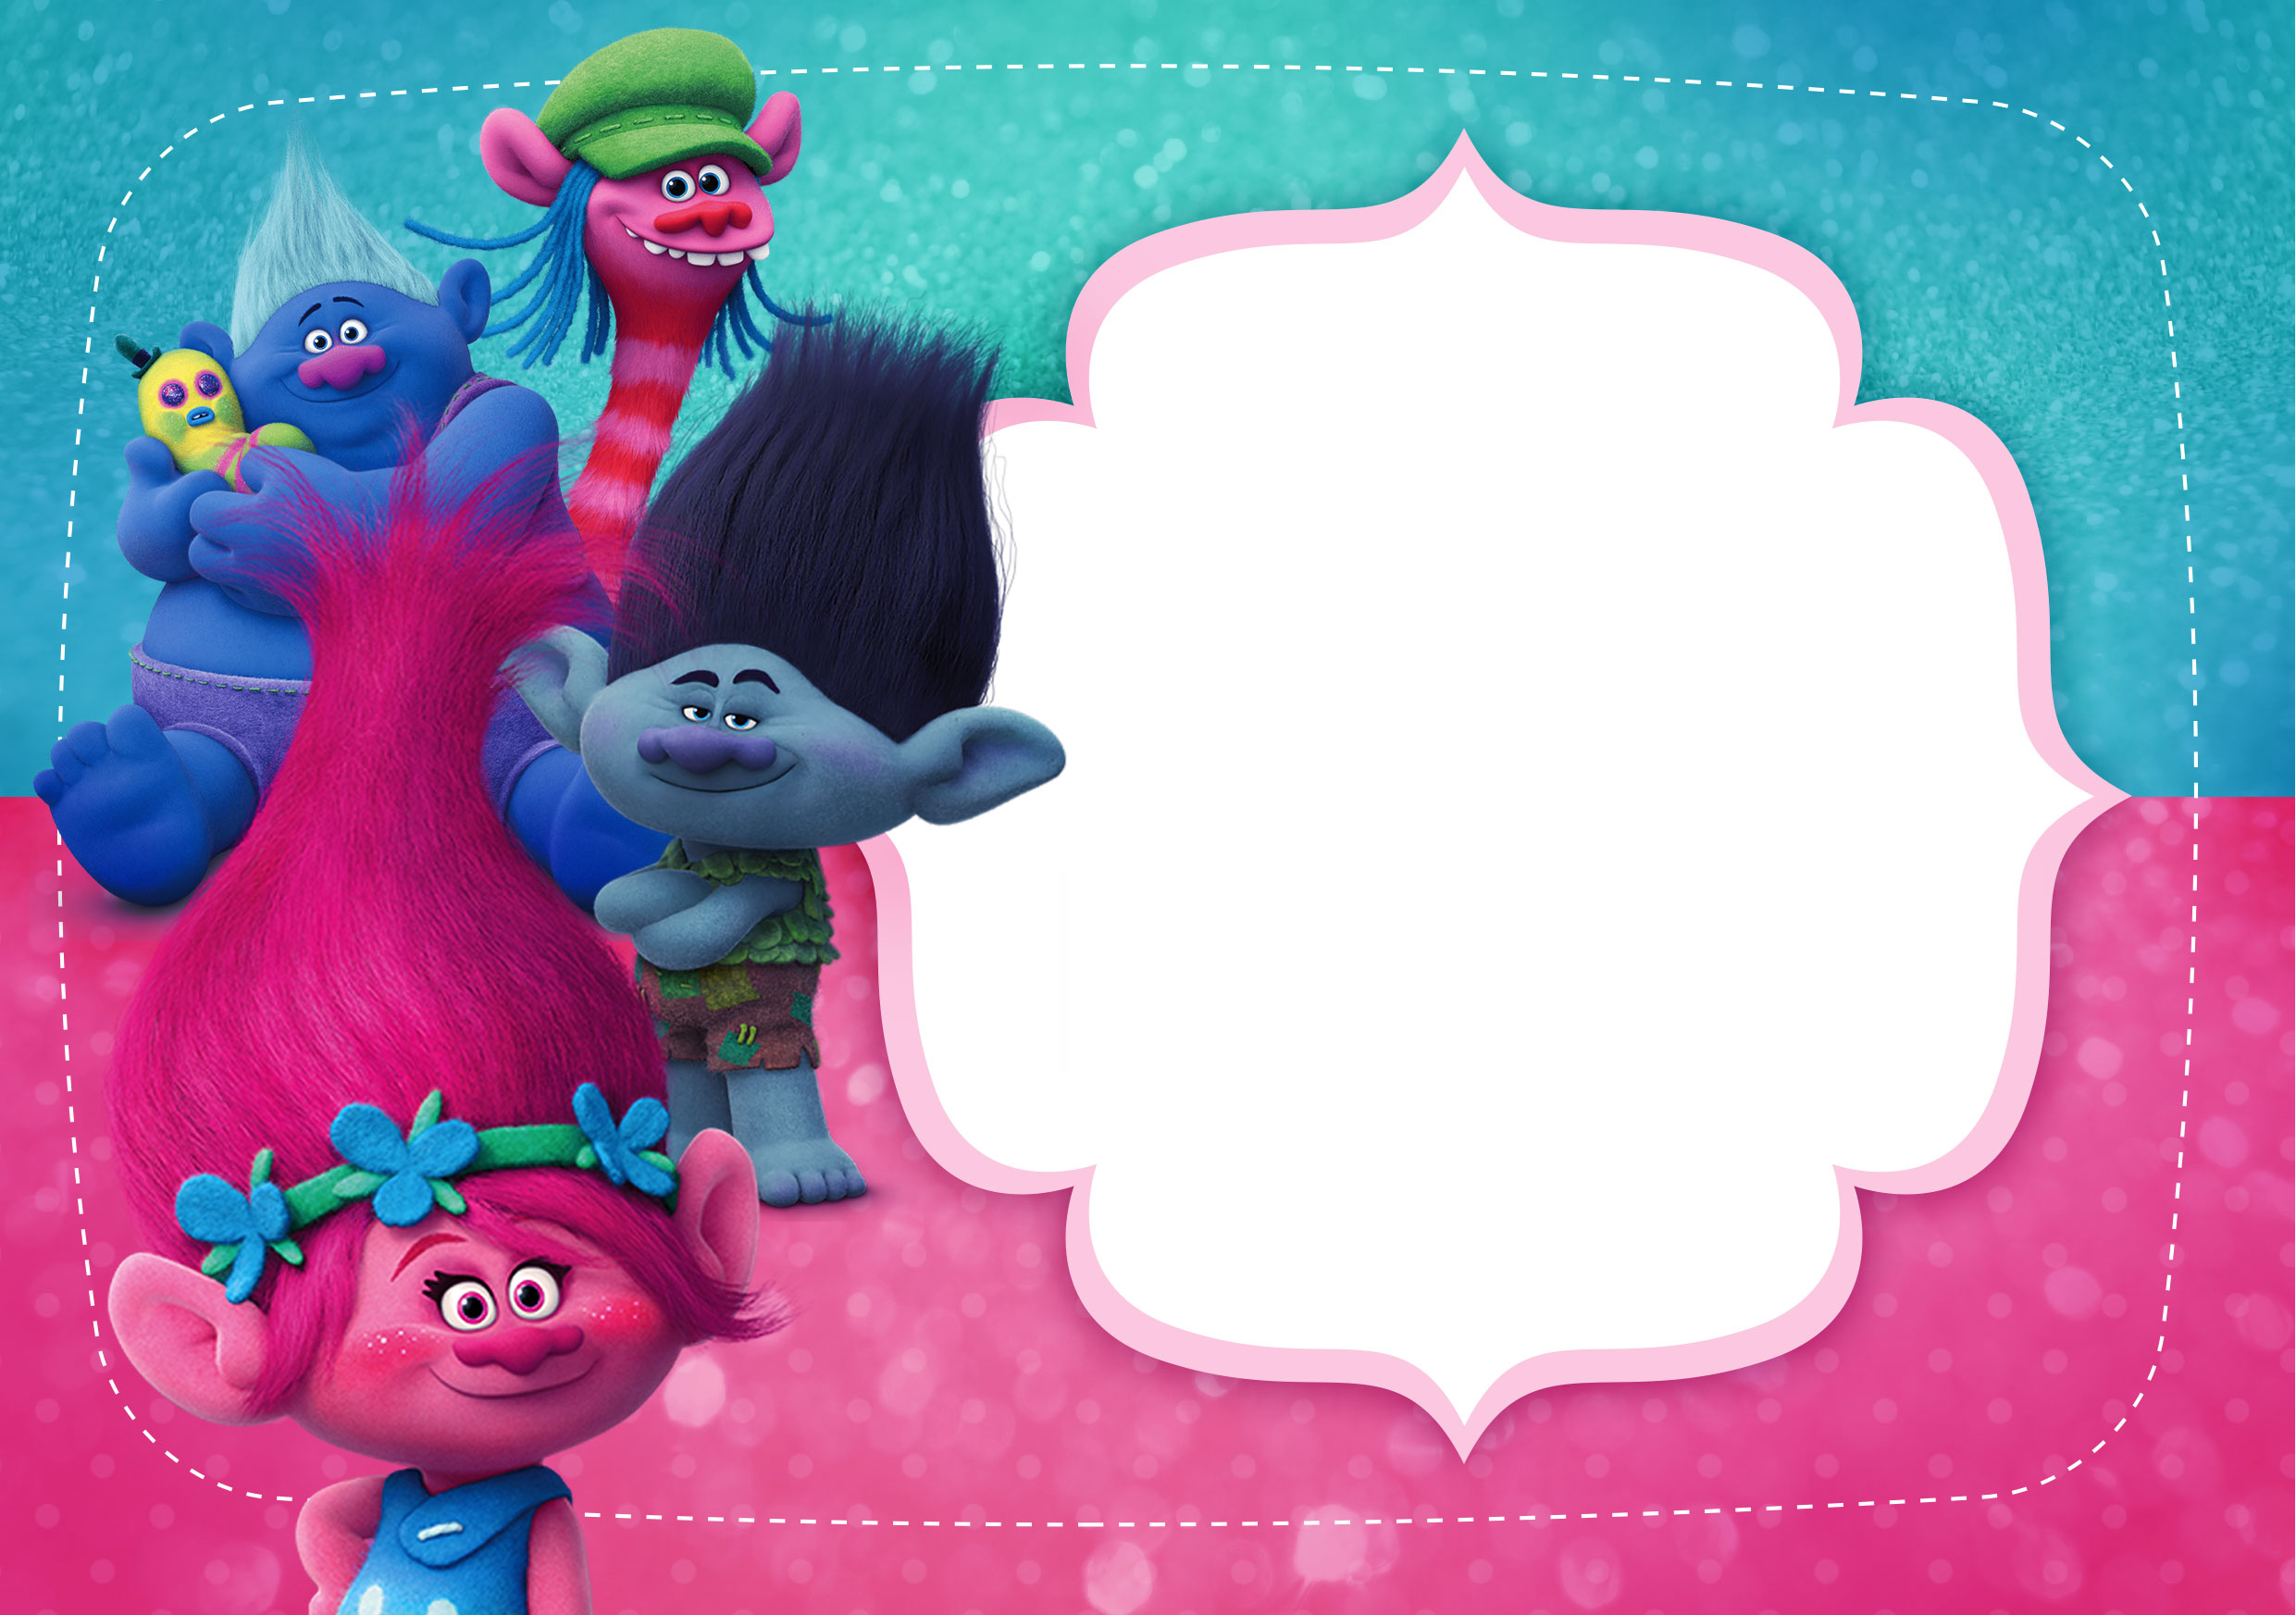 Convite Trolls grátis